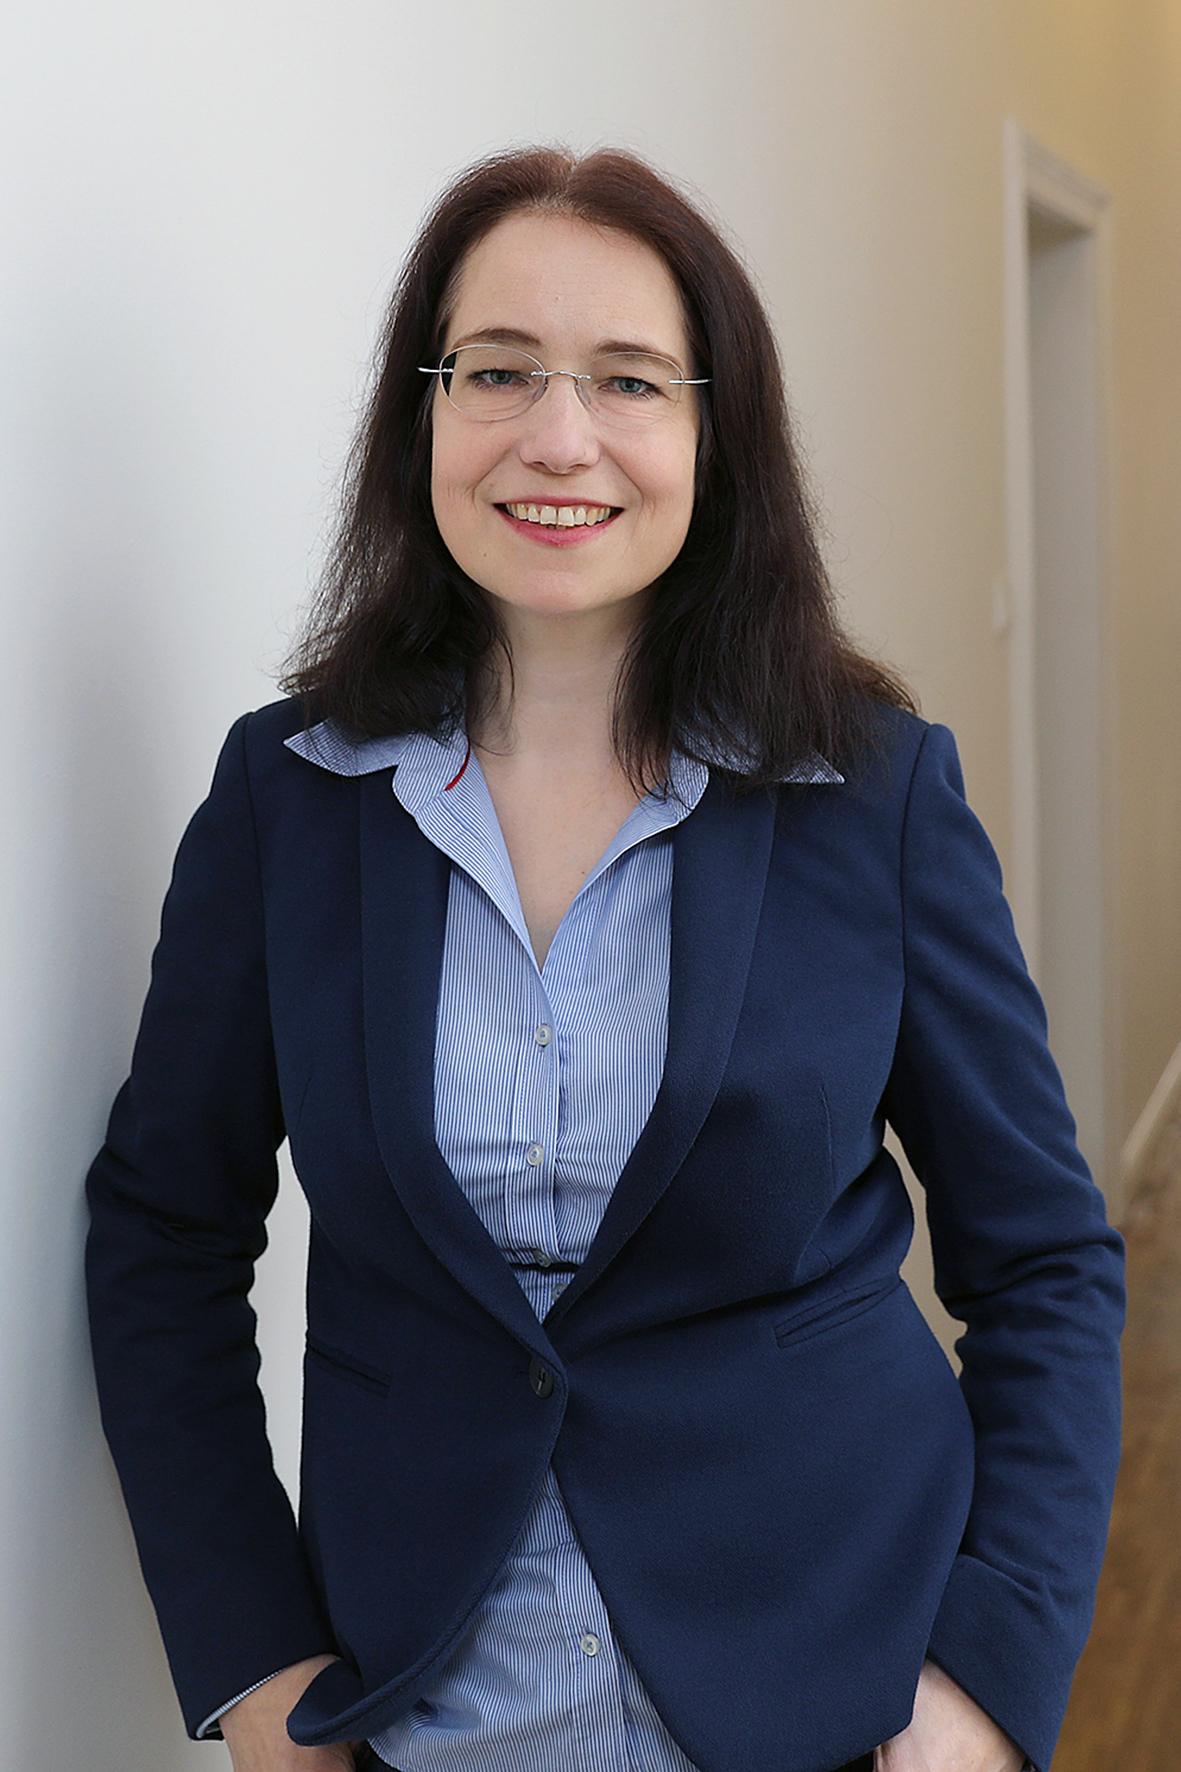 Claudia Hörner